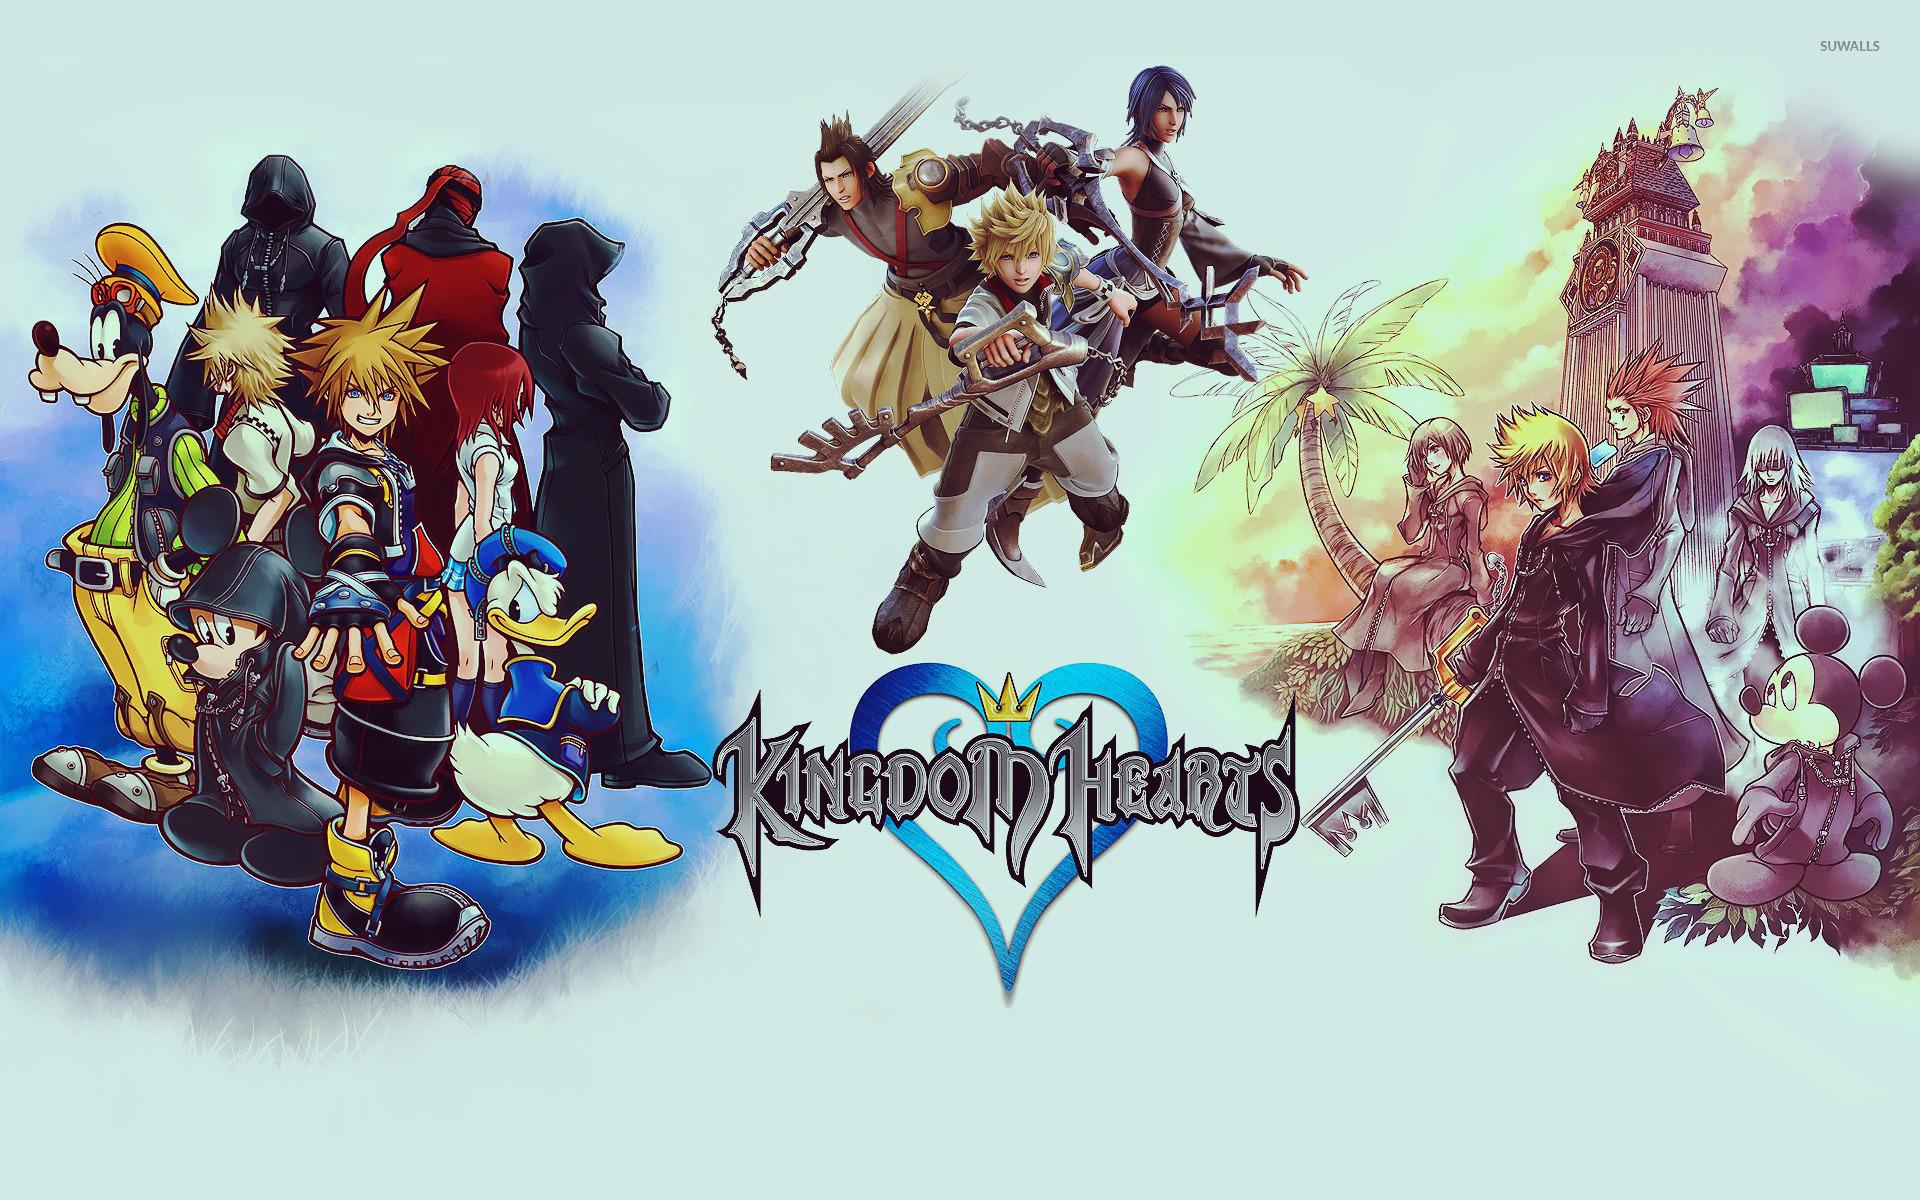 Kingdom Hearts 3 Wallpaper Game Wallpapers 14732